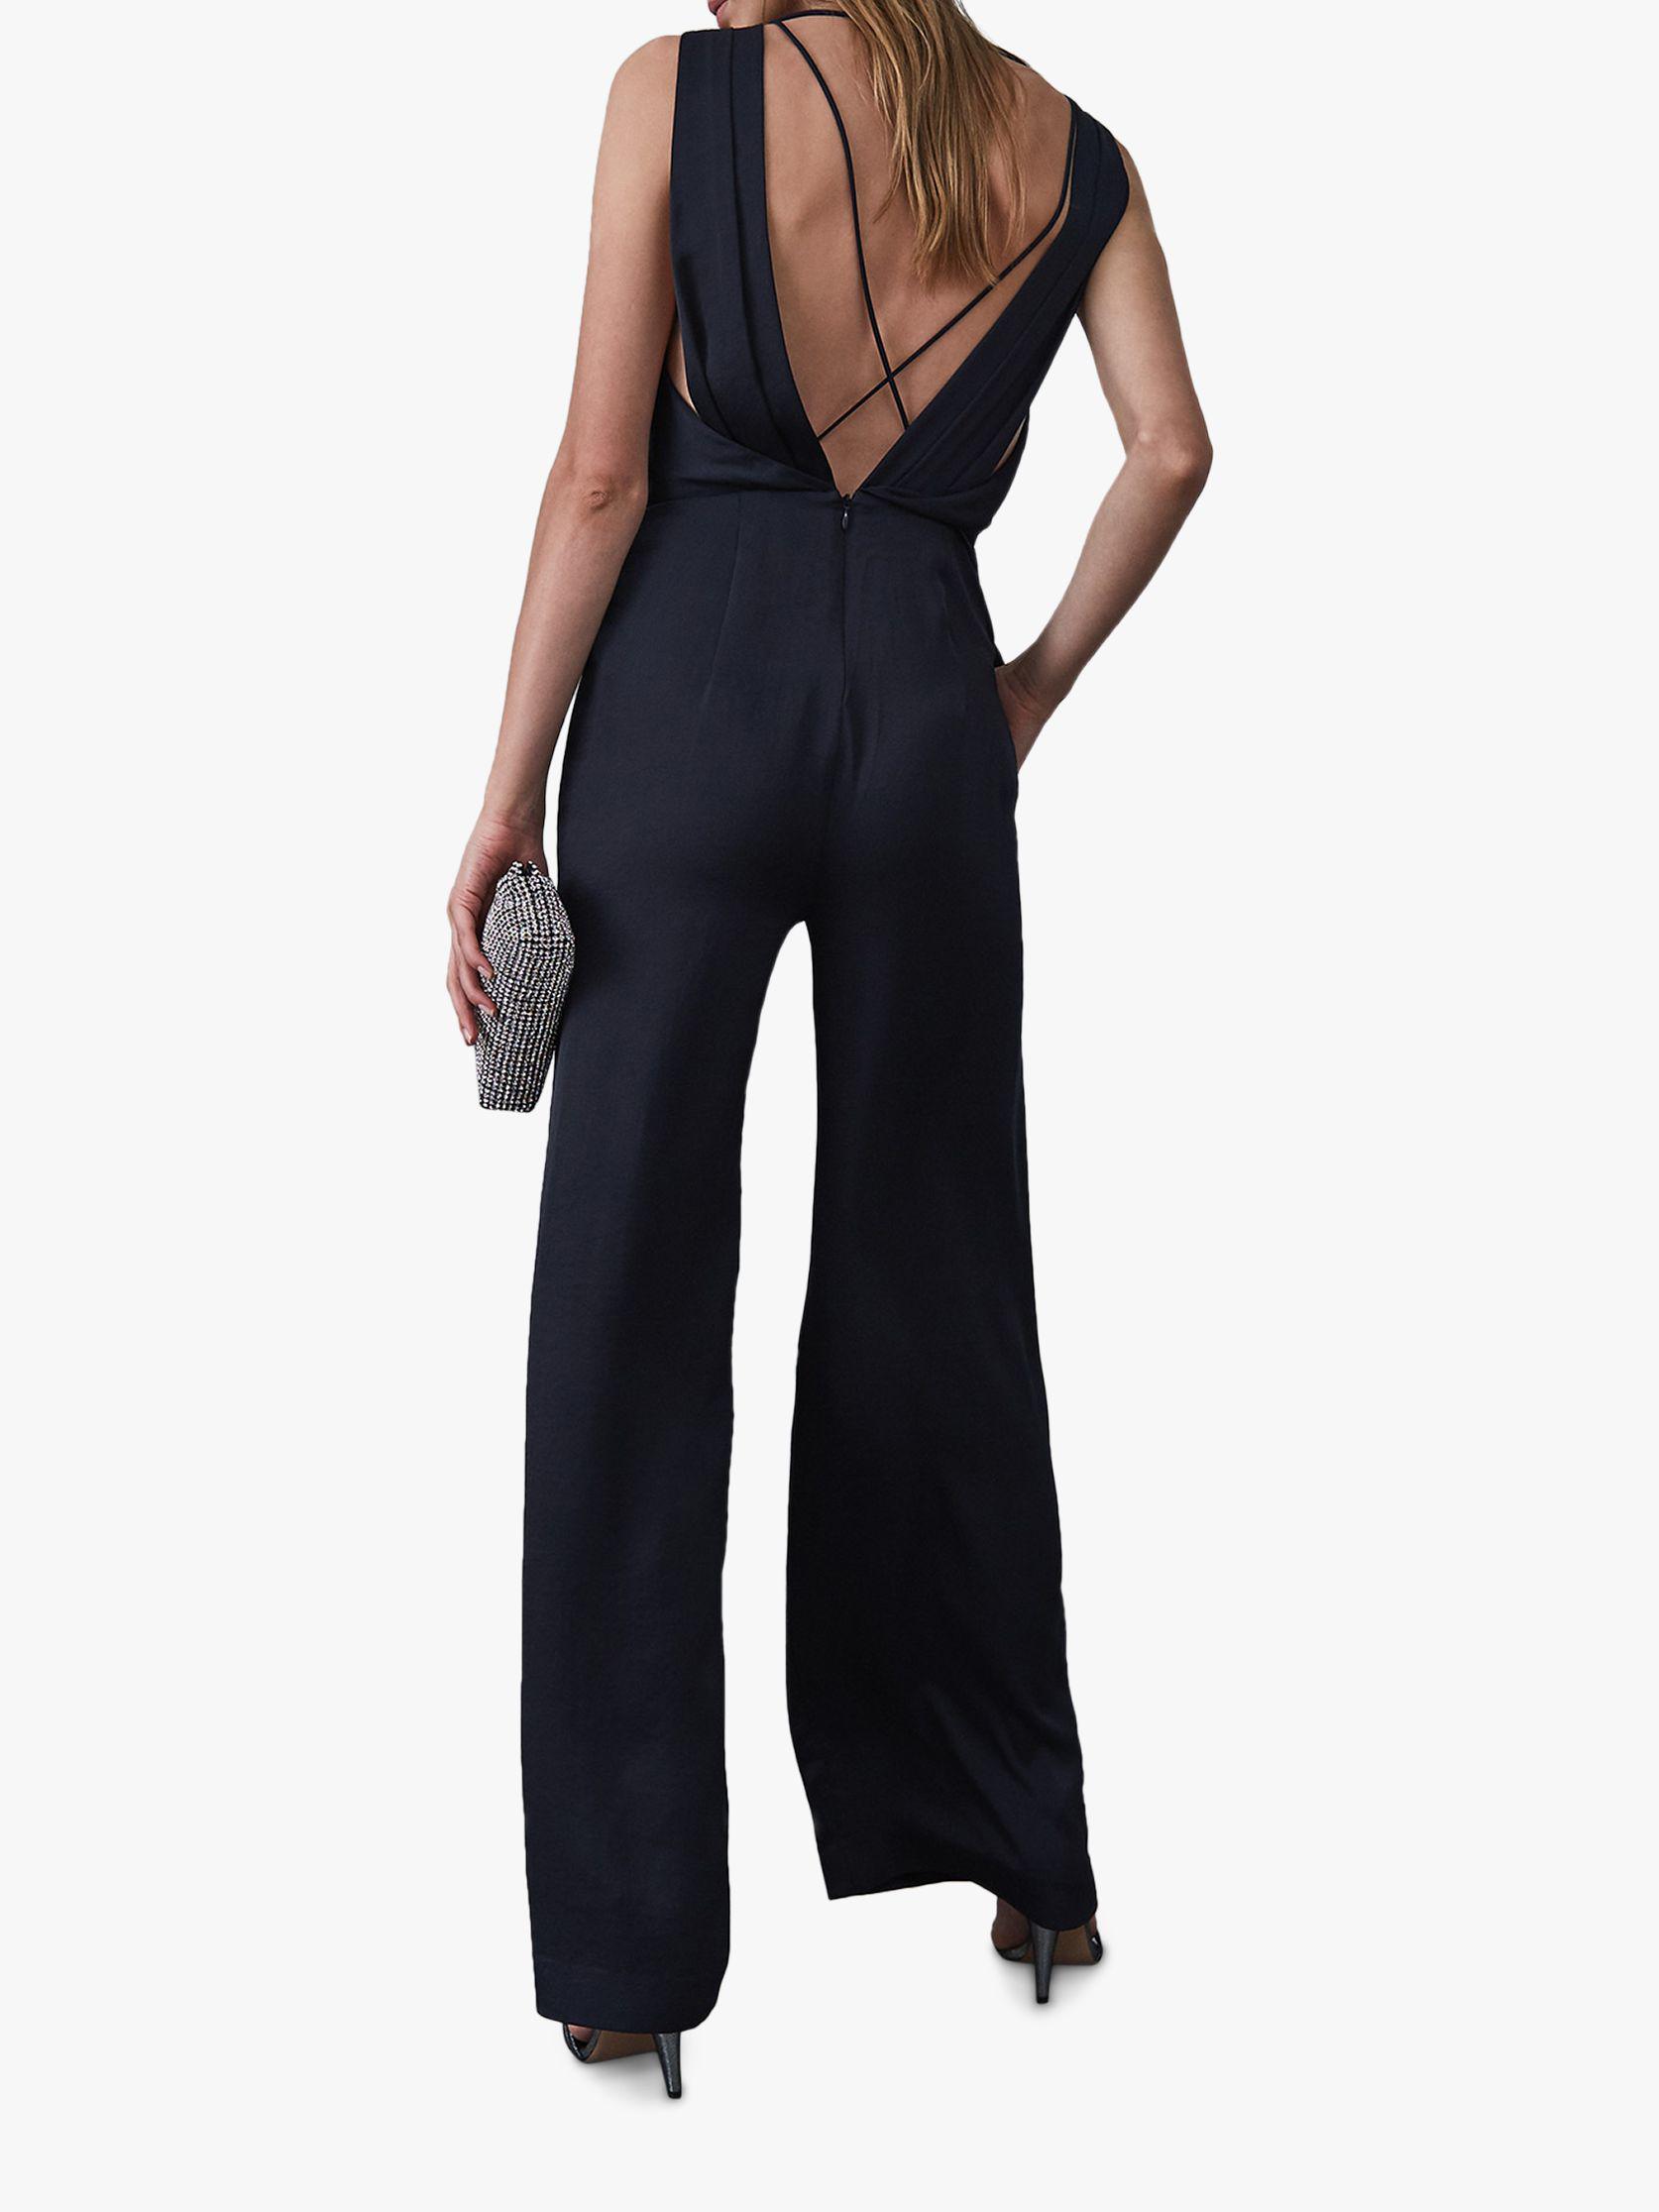 914d9057b7d Reiss Benita Draped Sleeveless Jumpsuit in Blue - Lyst